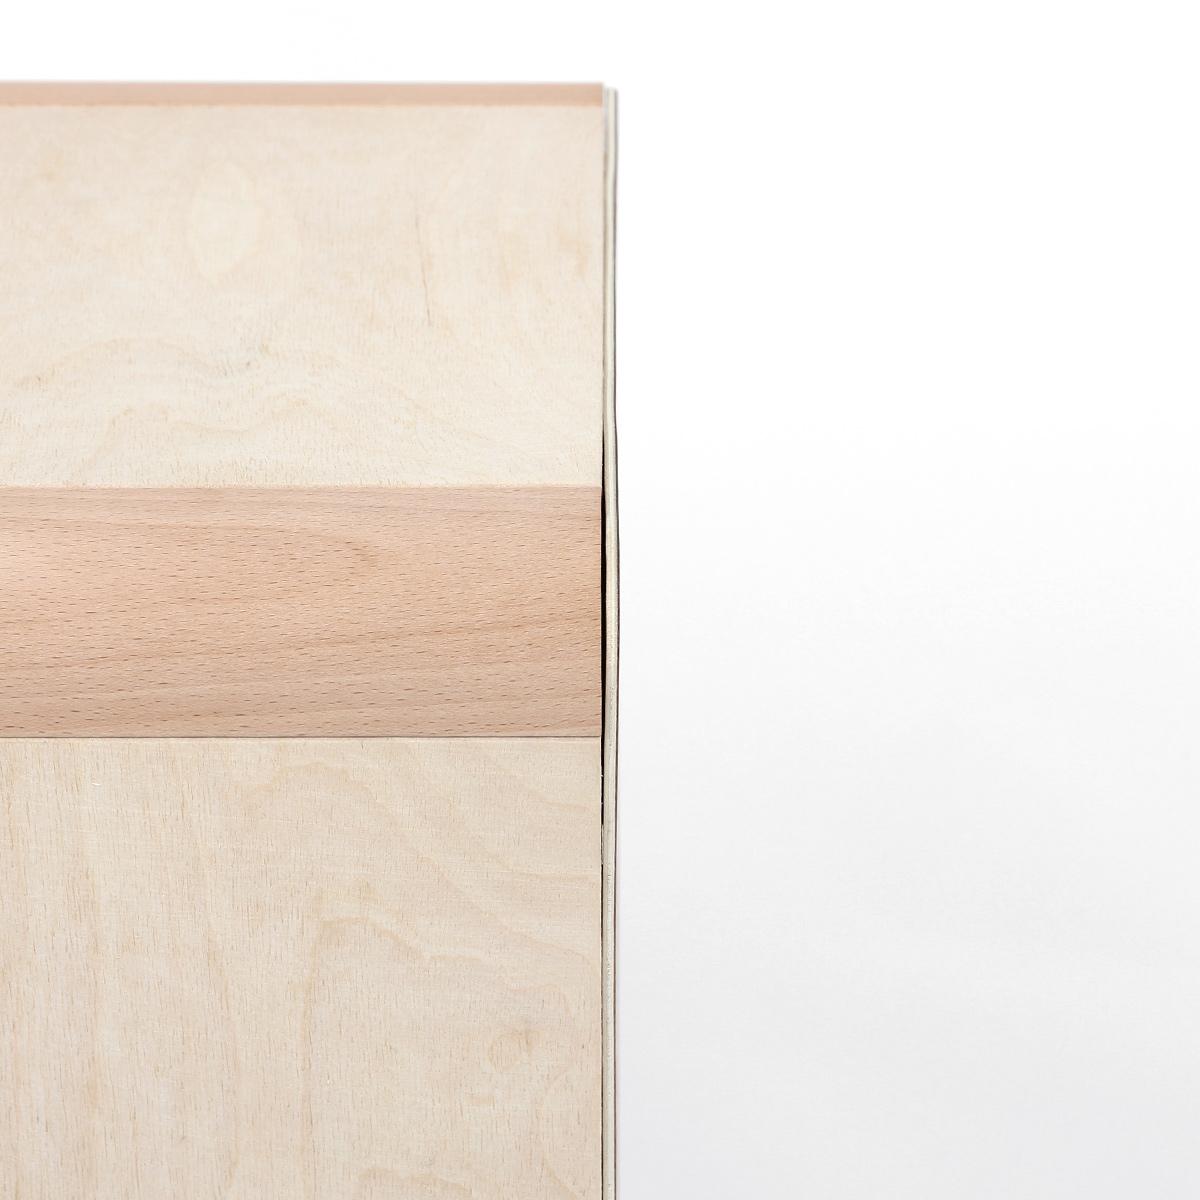 sela se 037 assembly kit cajon schnellbausatz. Black Bedroom Furniture Sets. Home Design Ideas